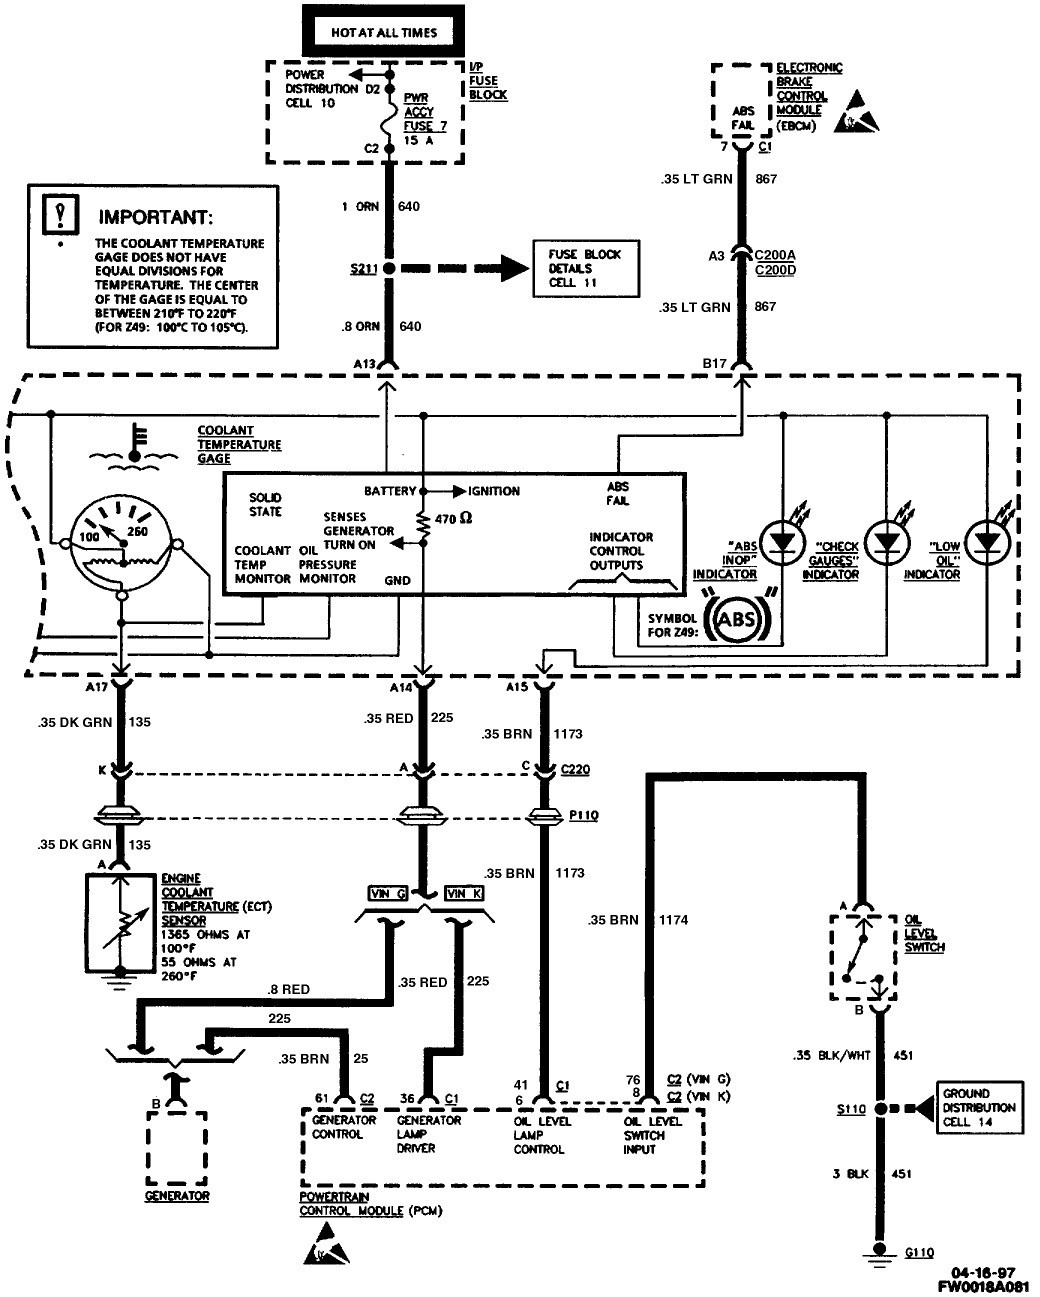 1998 Camaro Fuel Pump Wiring Diagram Schematics Diagrams Ls1 Custom U2022 Rh Littlewaves Co 1990 Chevy 98